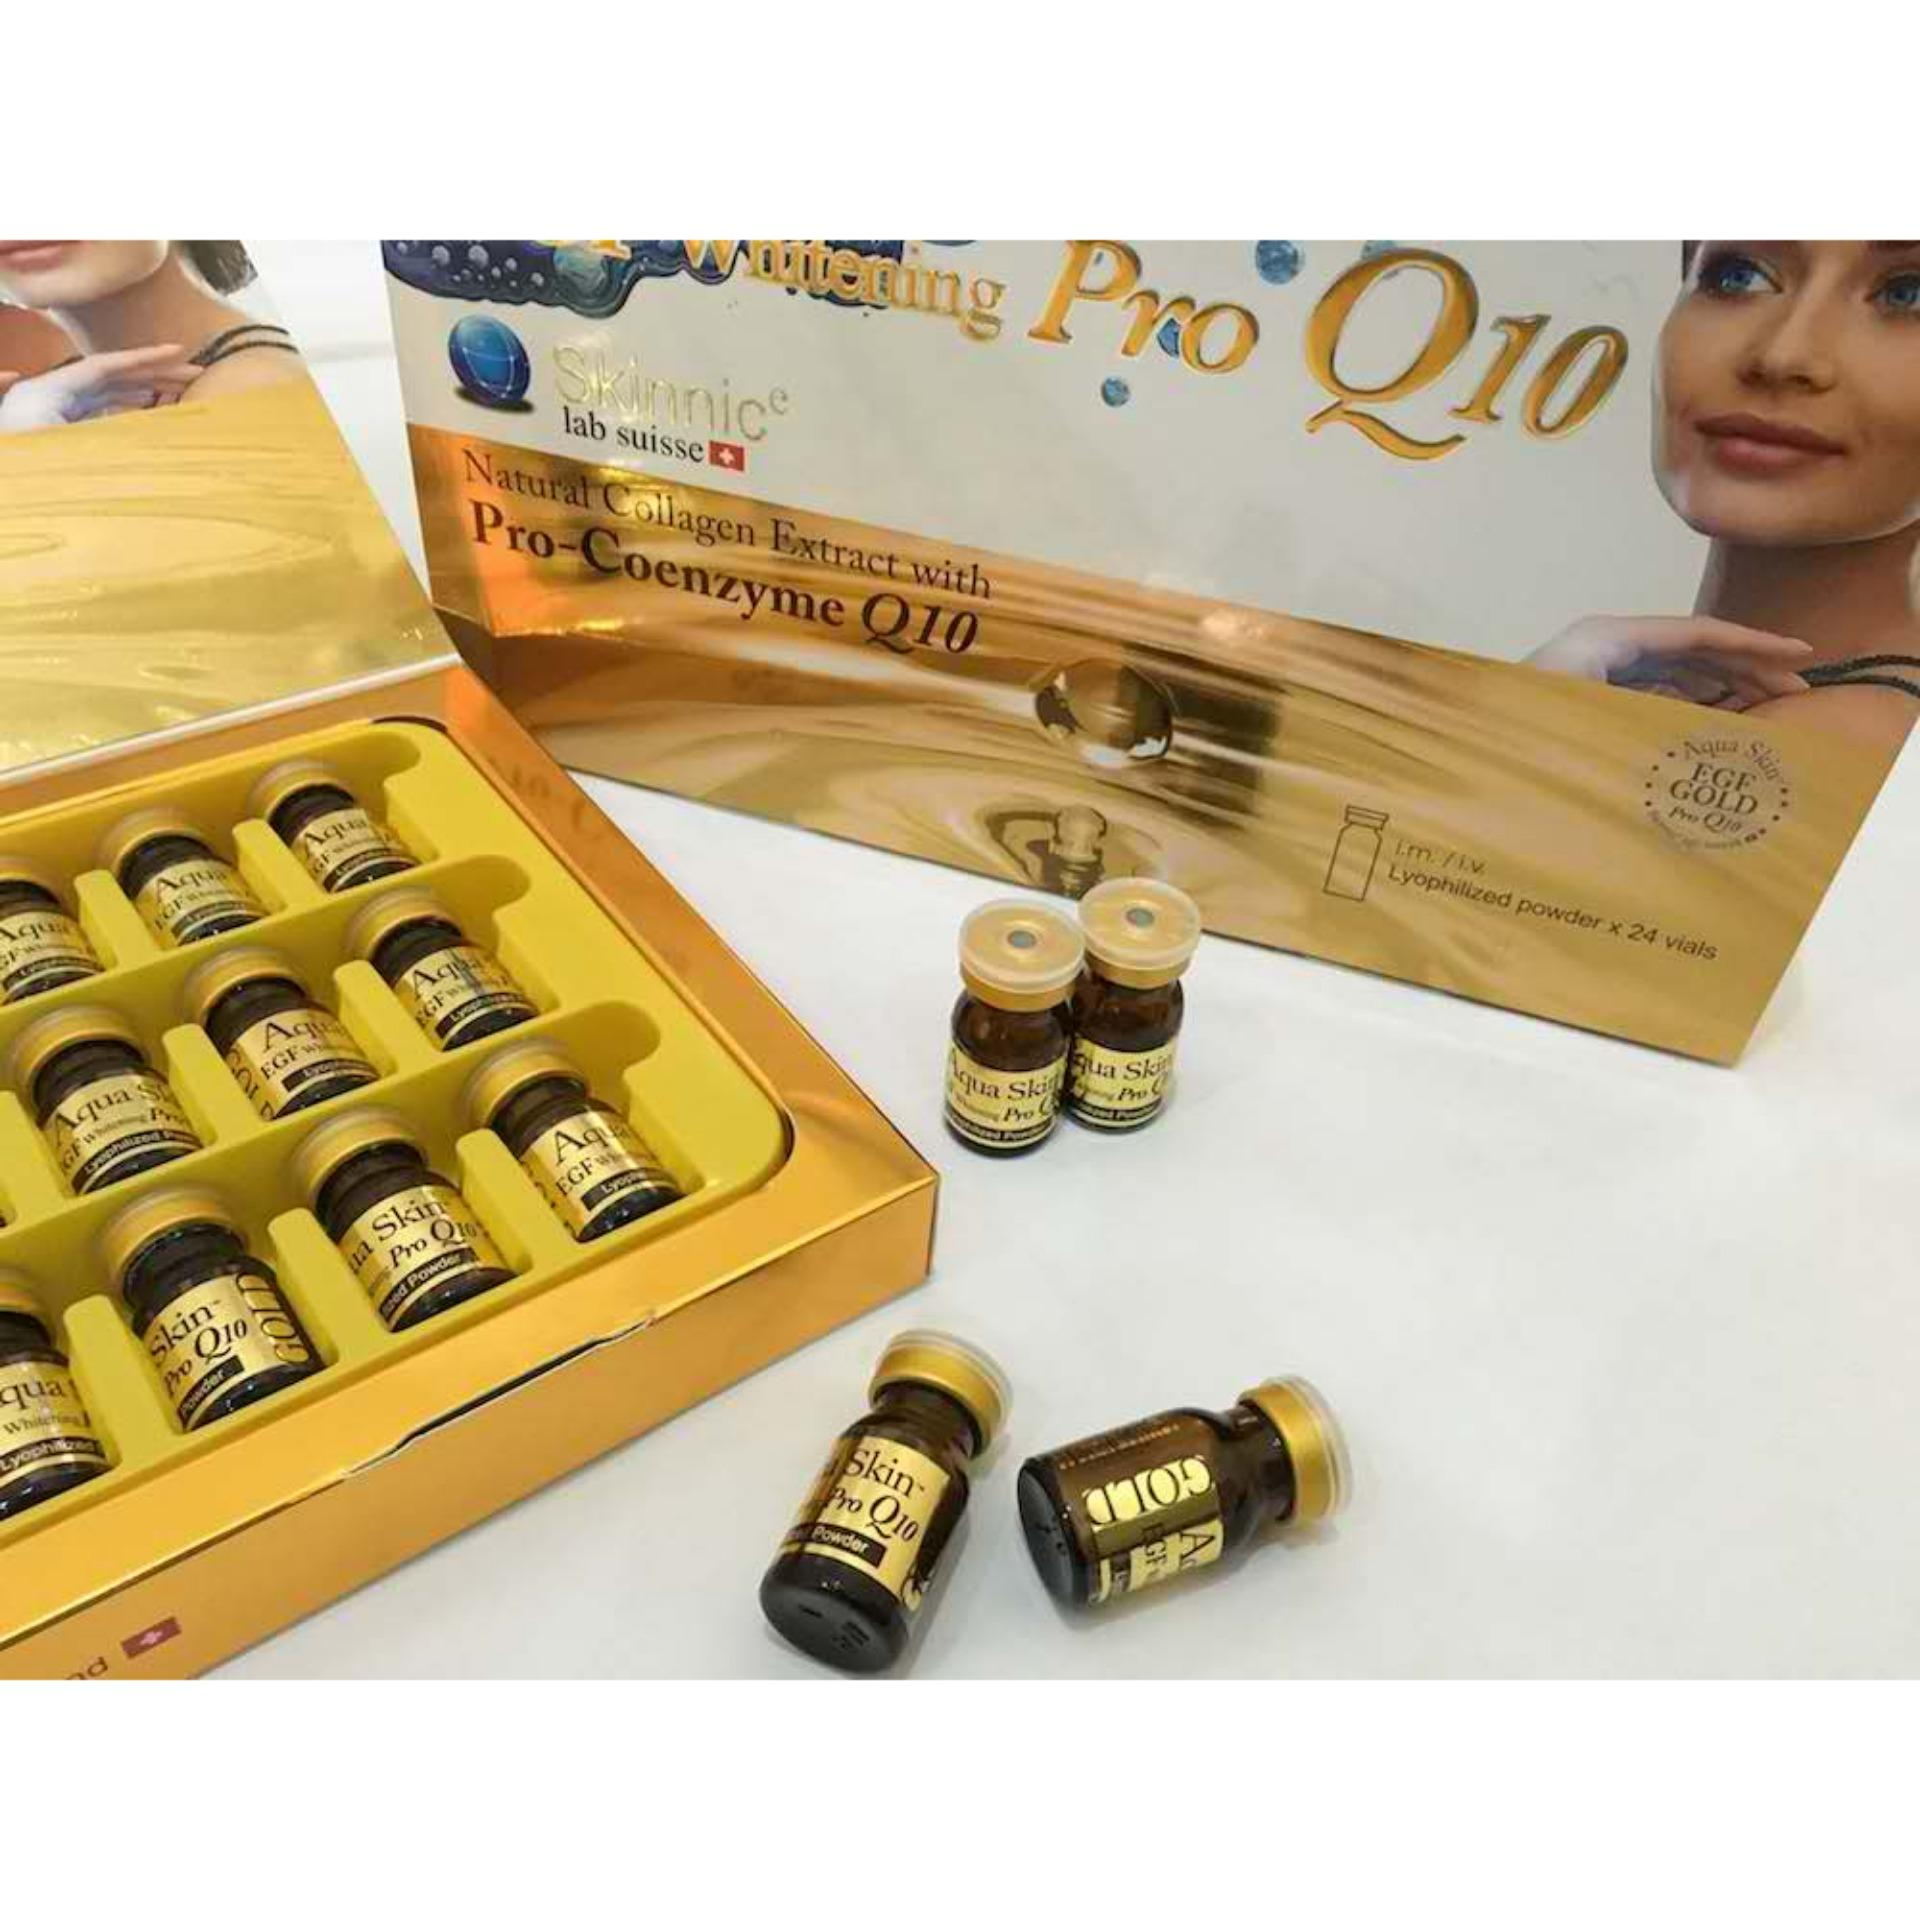 ... Authentic Aqua Skin EGF Whitening PROQ10 GOLD 24 vialsSkin-Whitening Anti-aging Glutathione IV ...